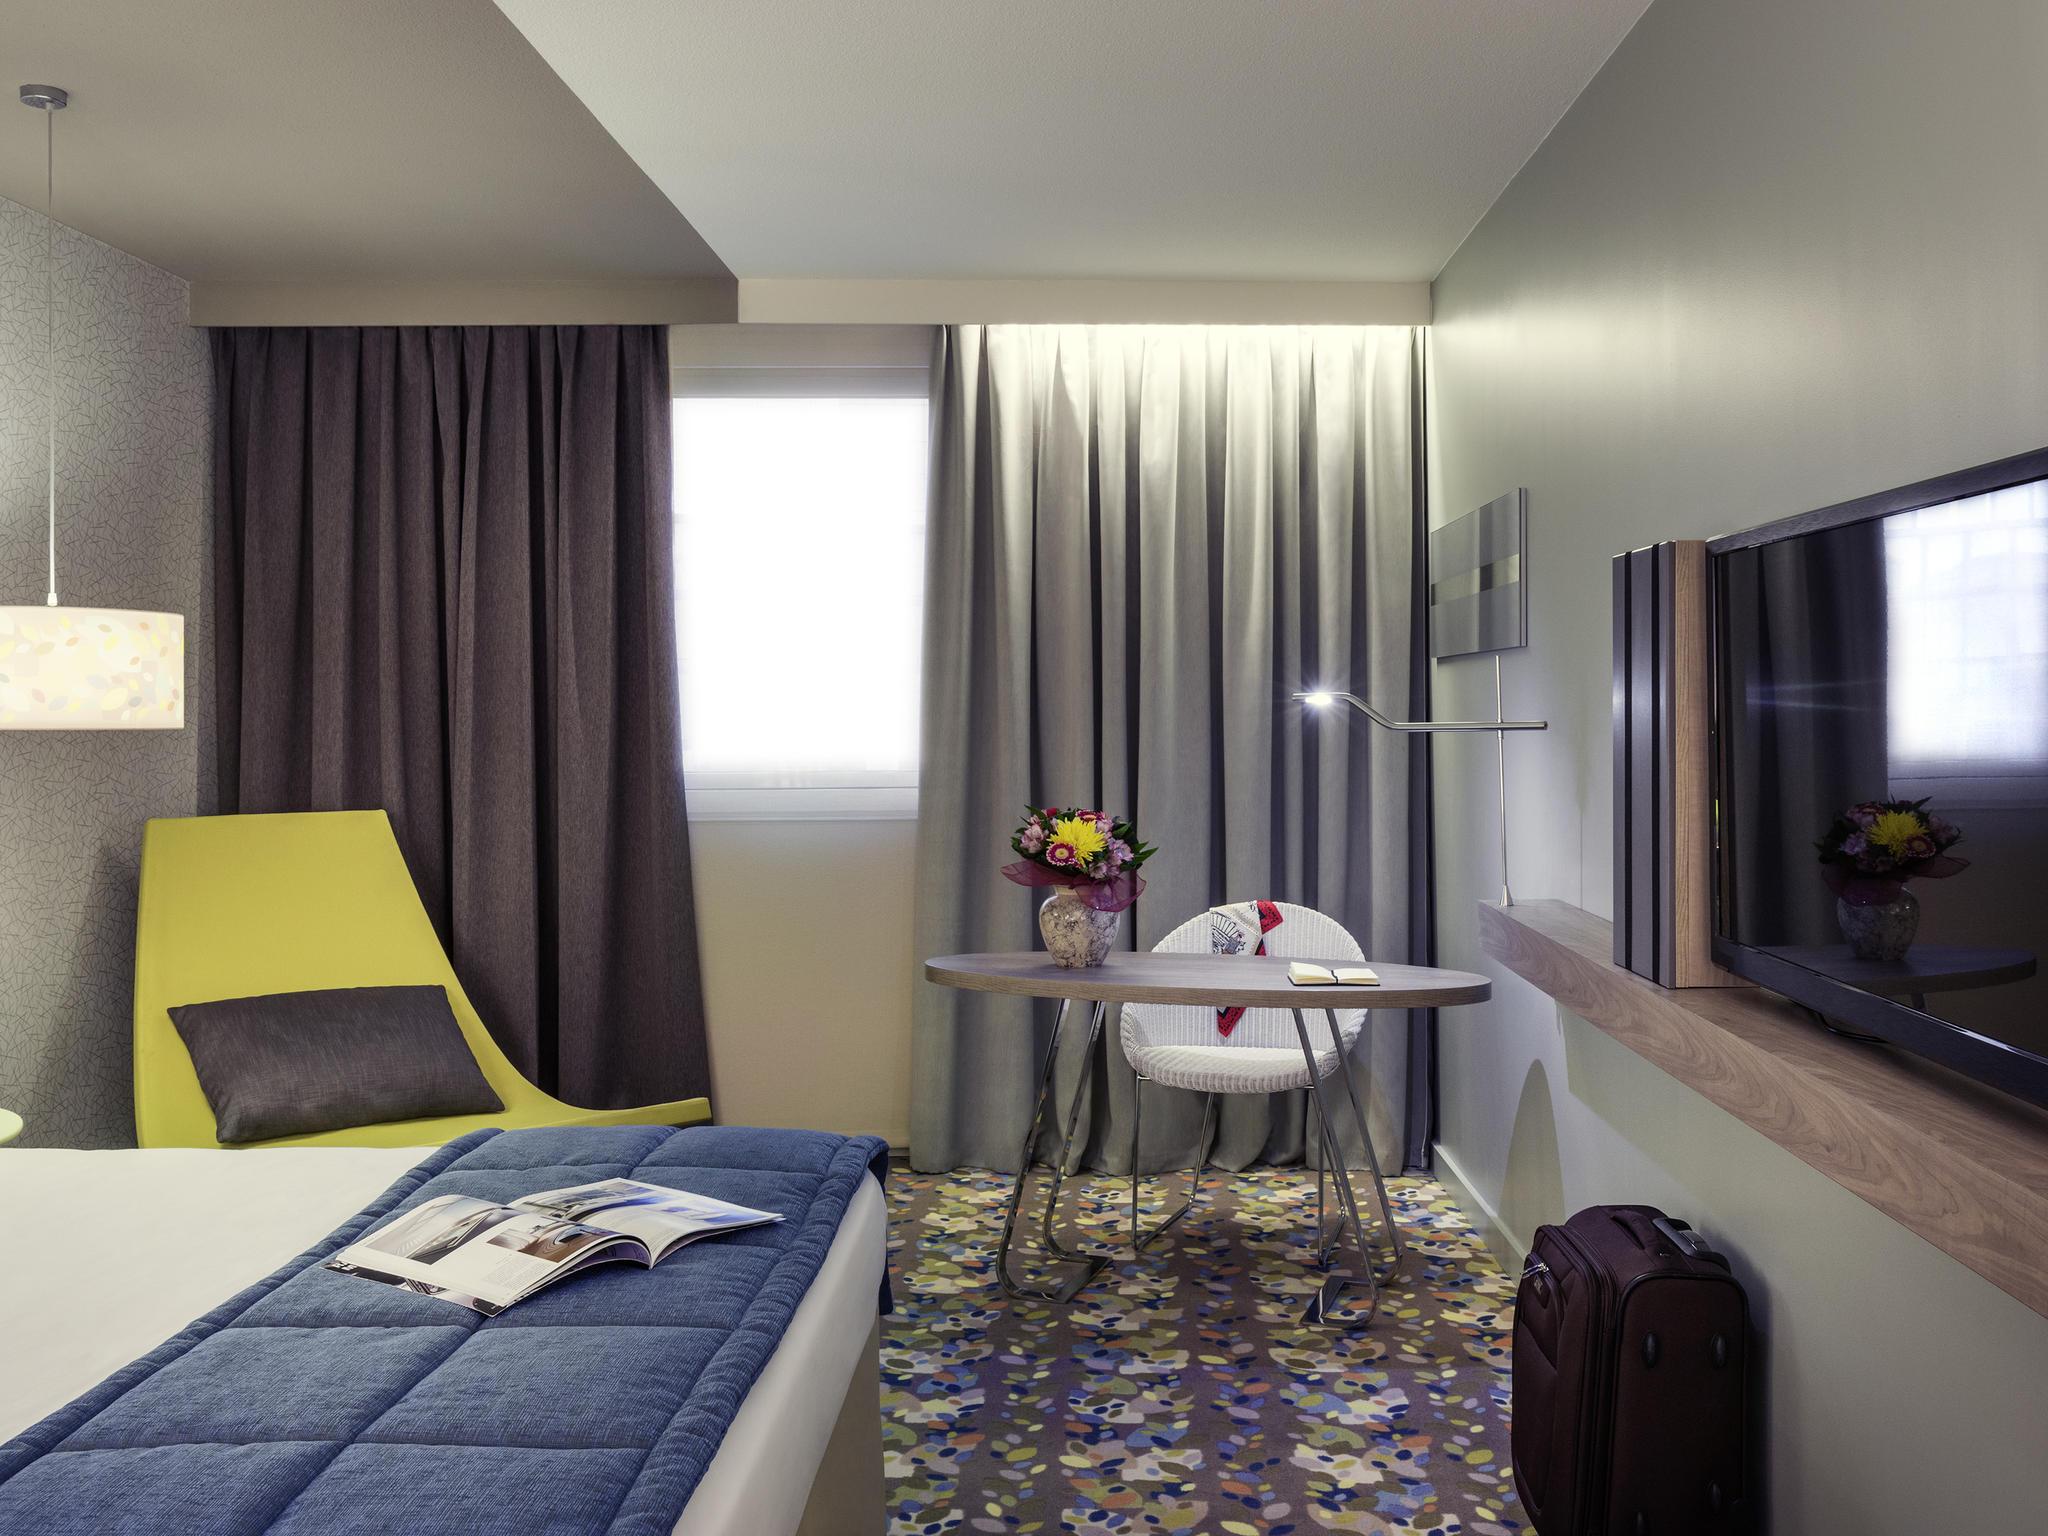 فندق - Hôtel Mercure Paris Val de Fontenay